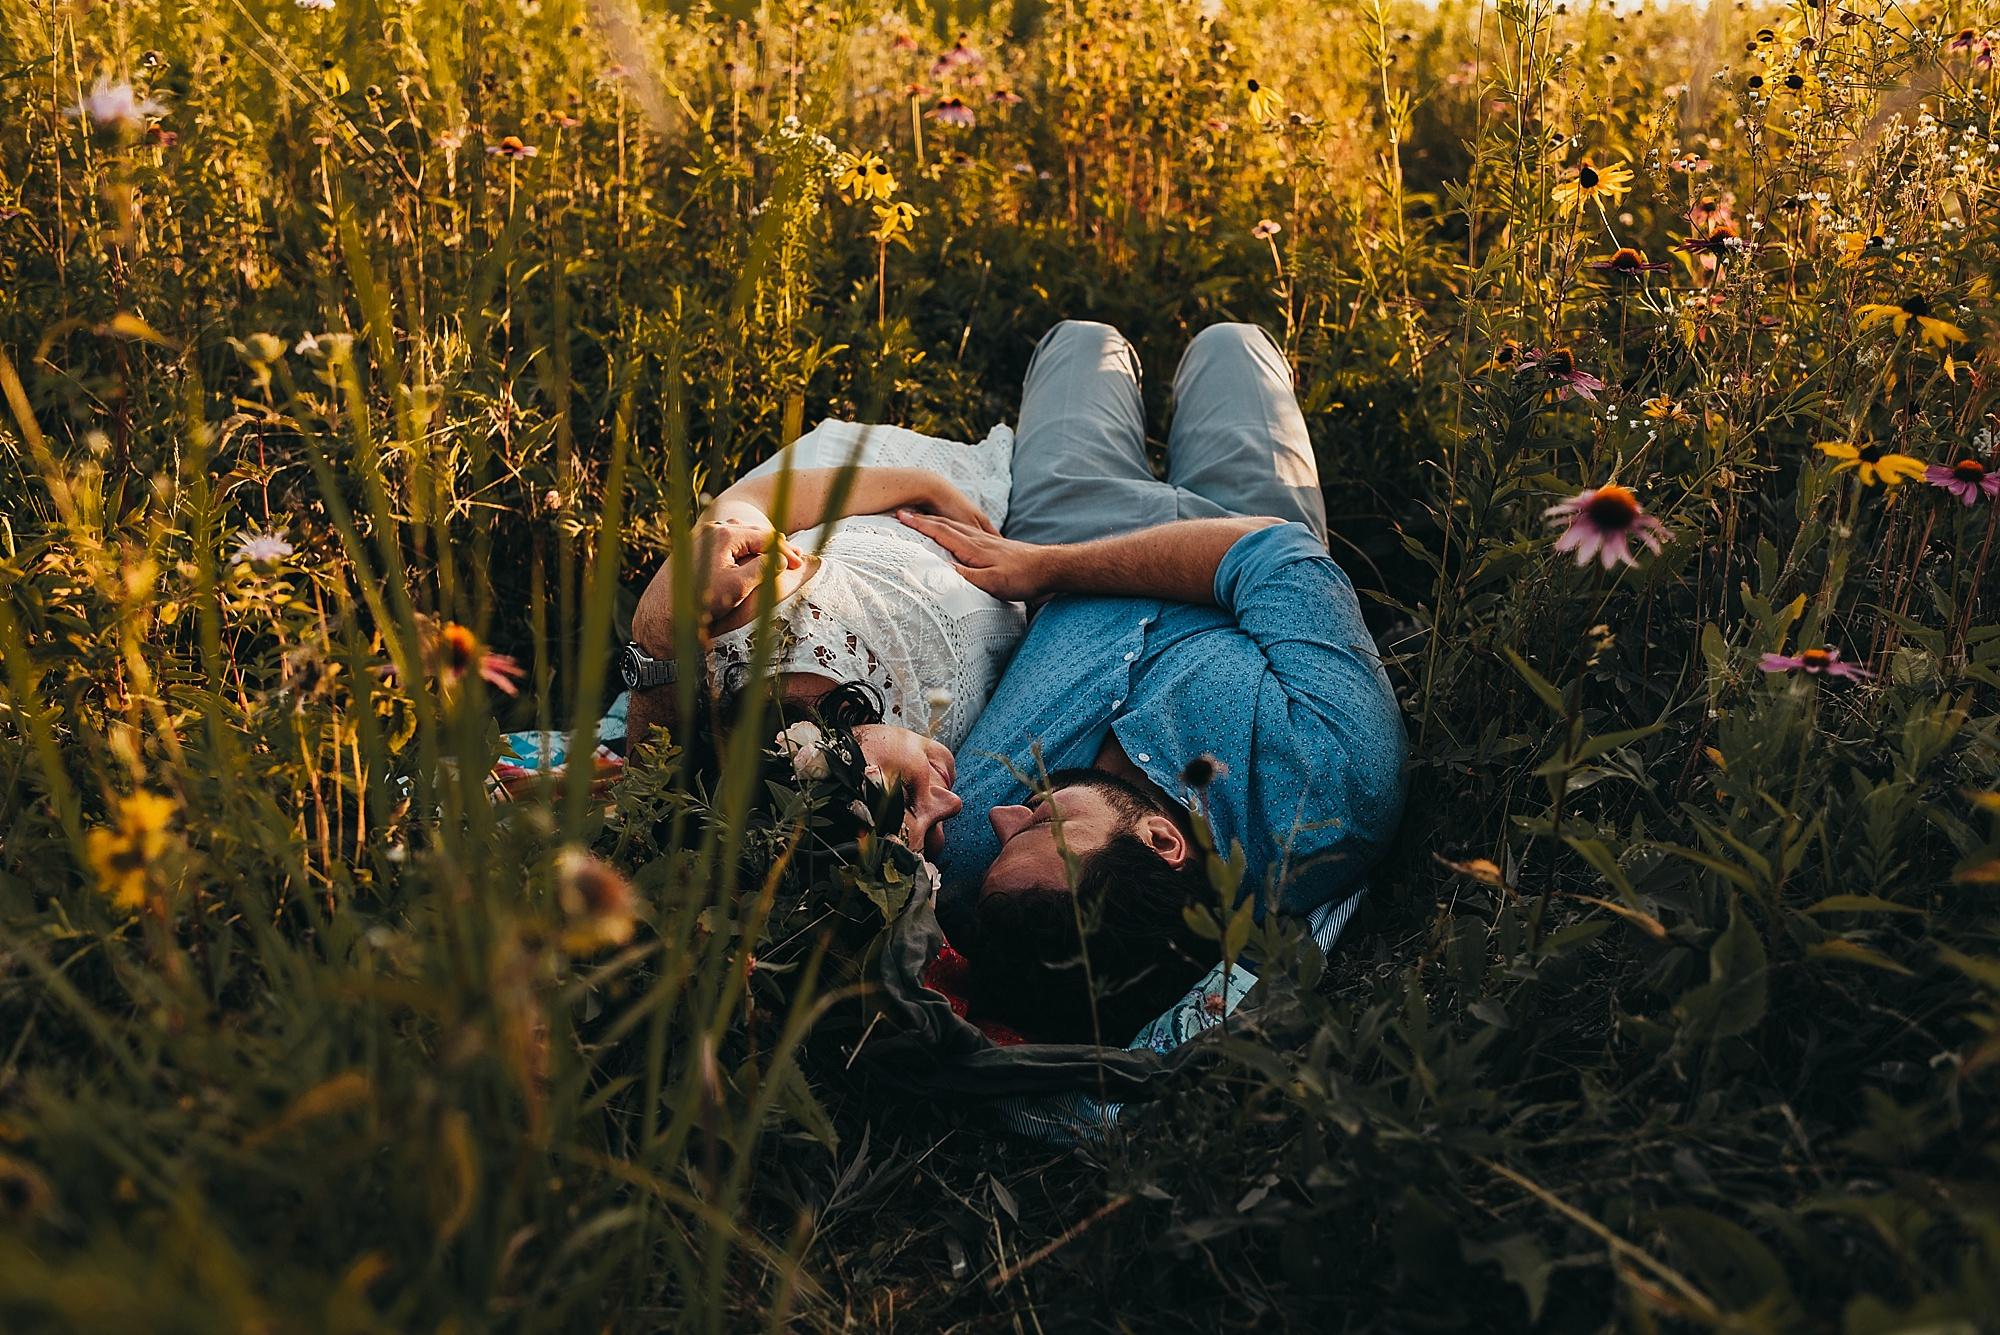 lauren-grayson-photography-cleveland-ohio-photographer-maternity-summer-outdoor-bohemian-fields-session_0493.jpg